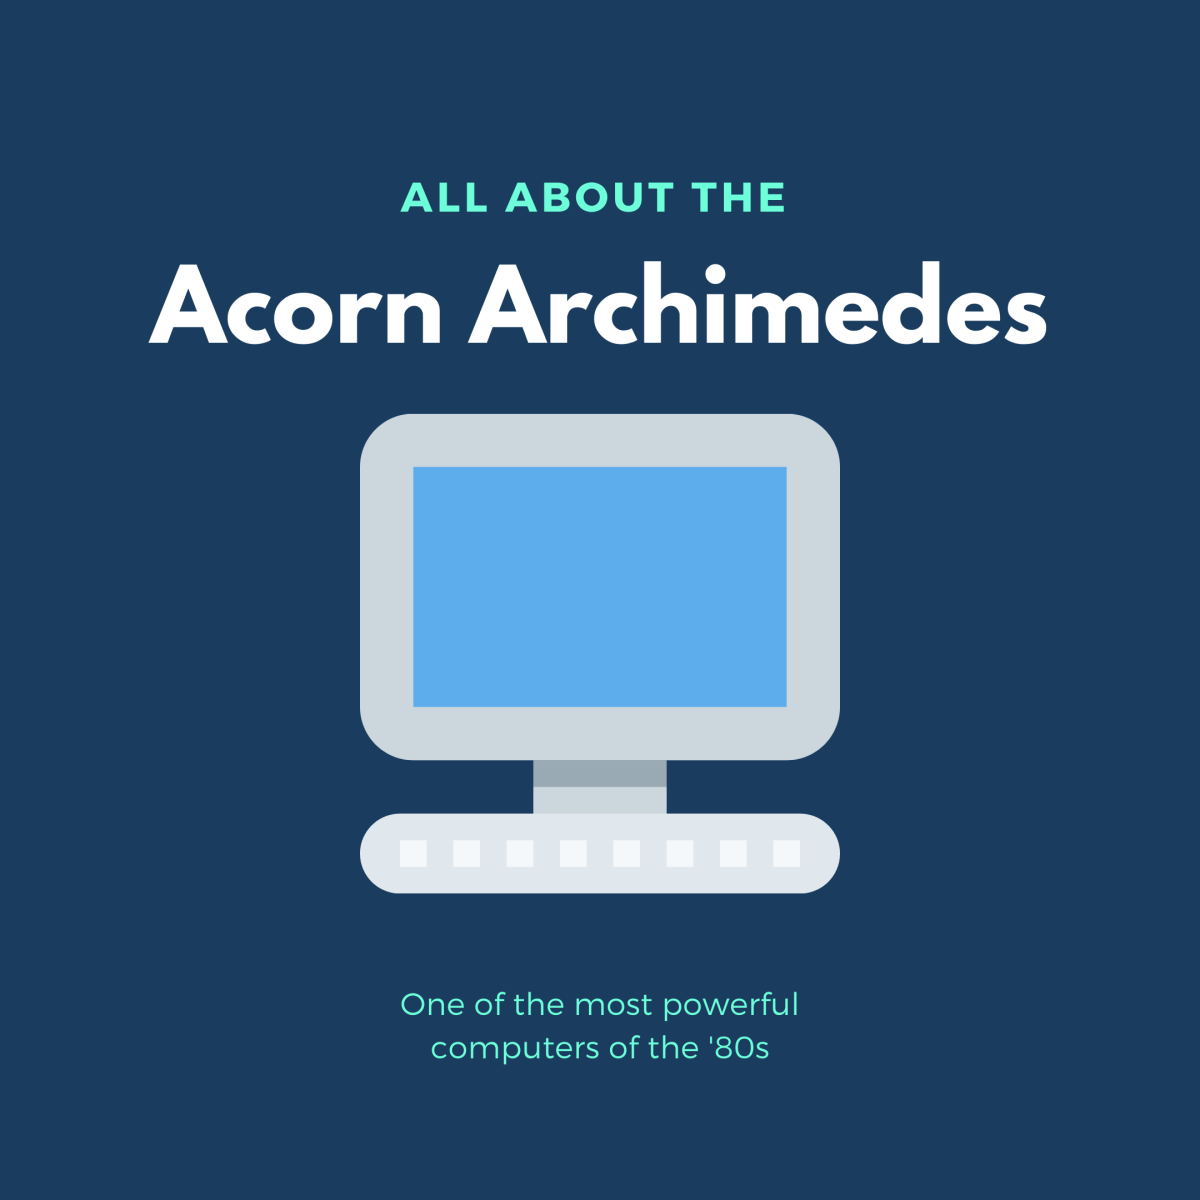 Acorn Archimedes